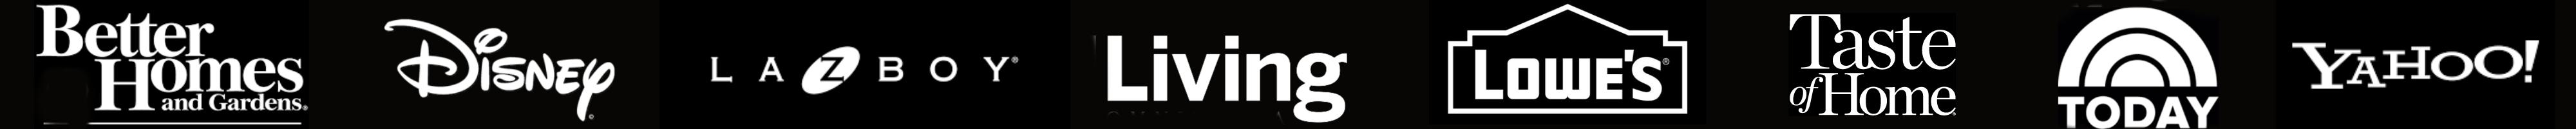 popular company logos on black background